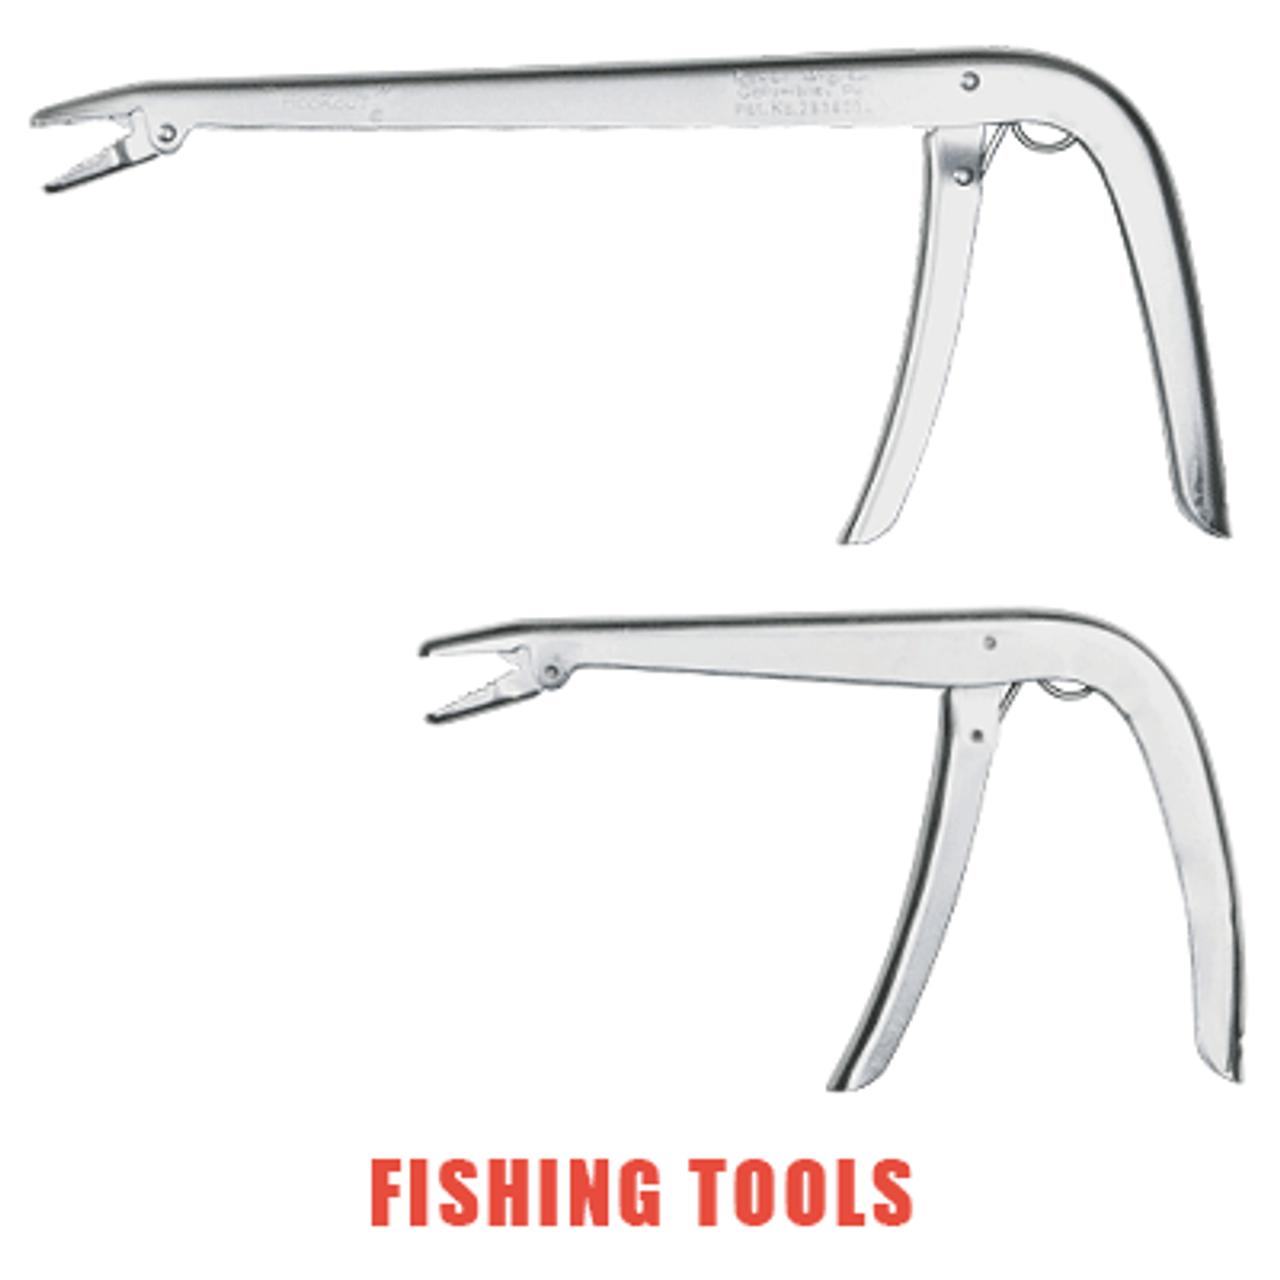 Fishing Tools/Tackle Storage